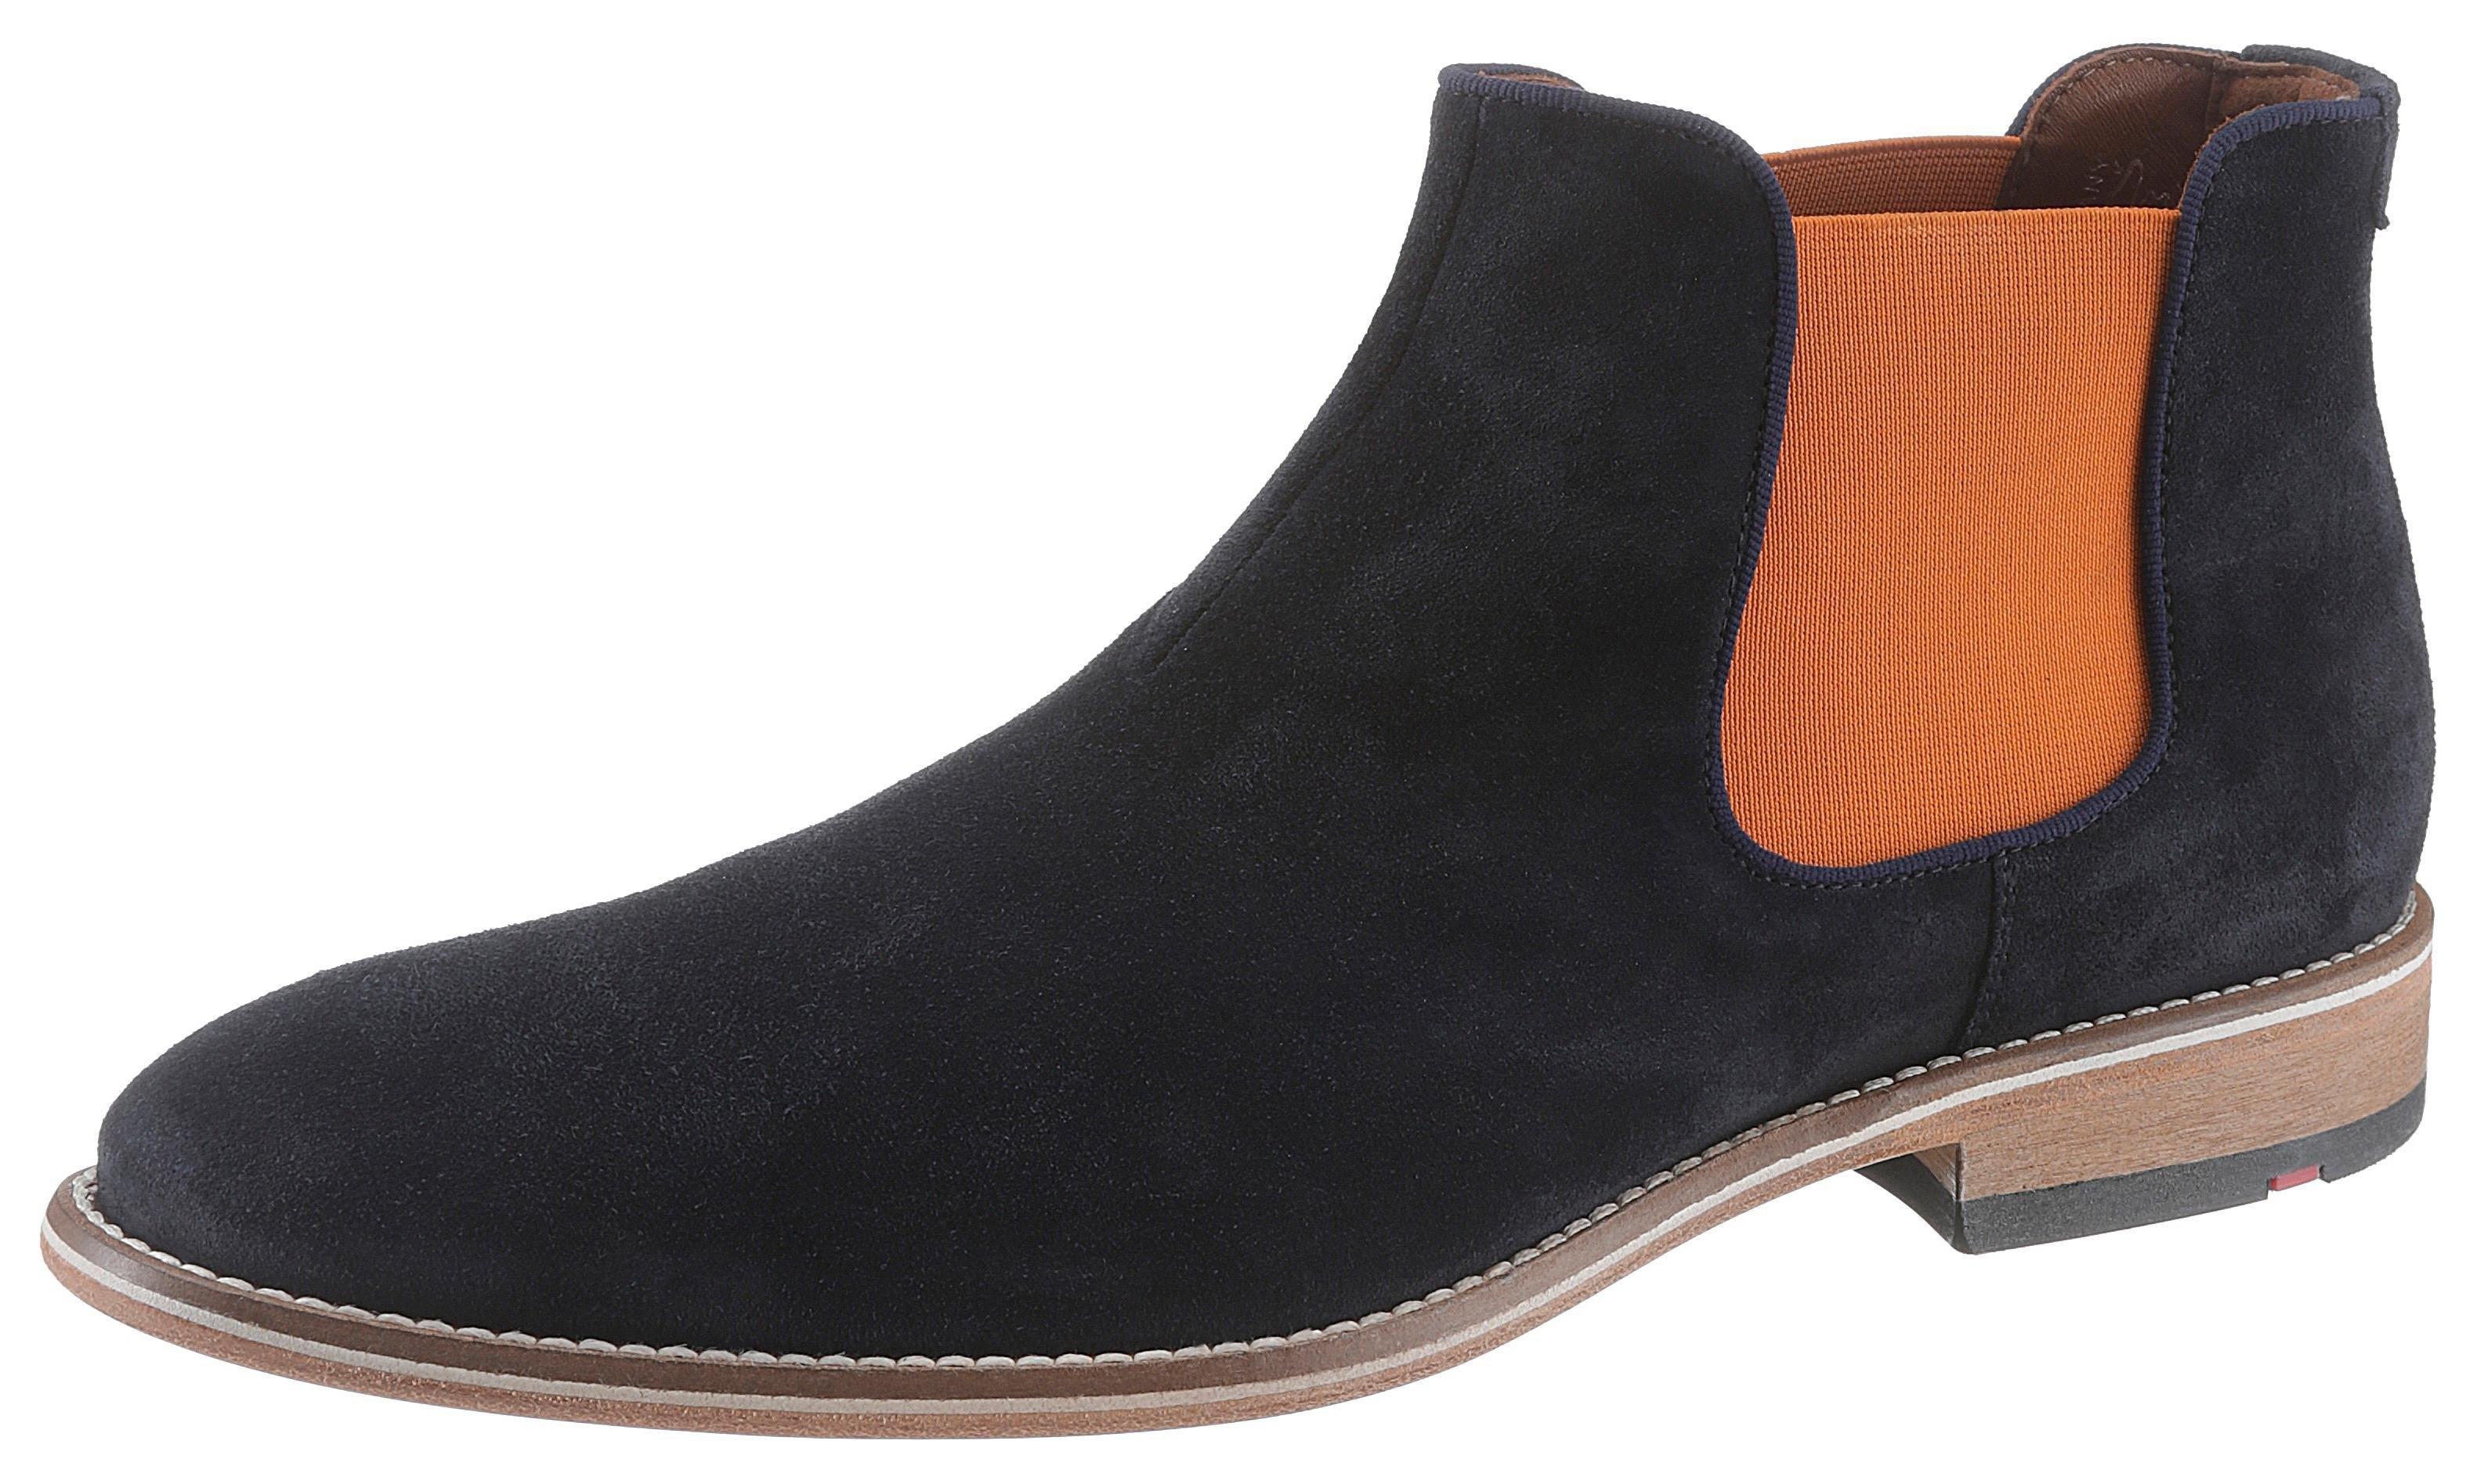 Lloyd Chelsea-boots »Gerson« veilig op otto.nl kopen